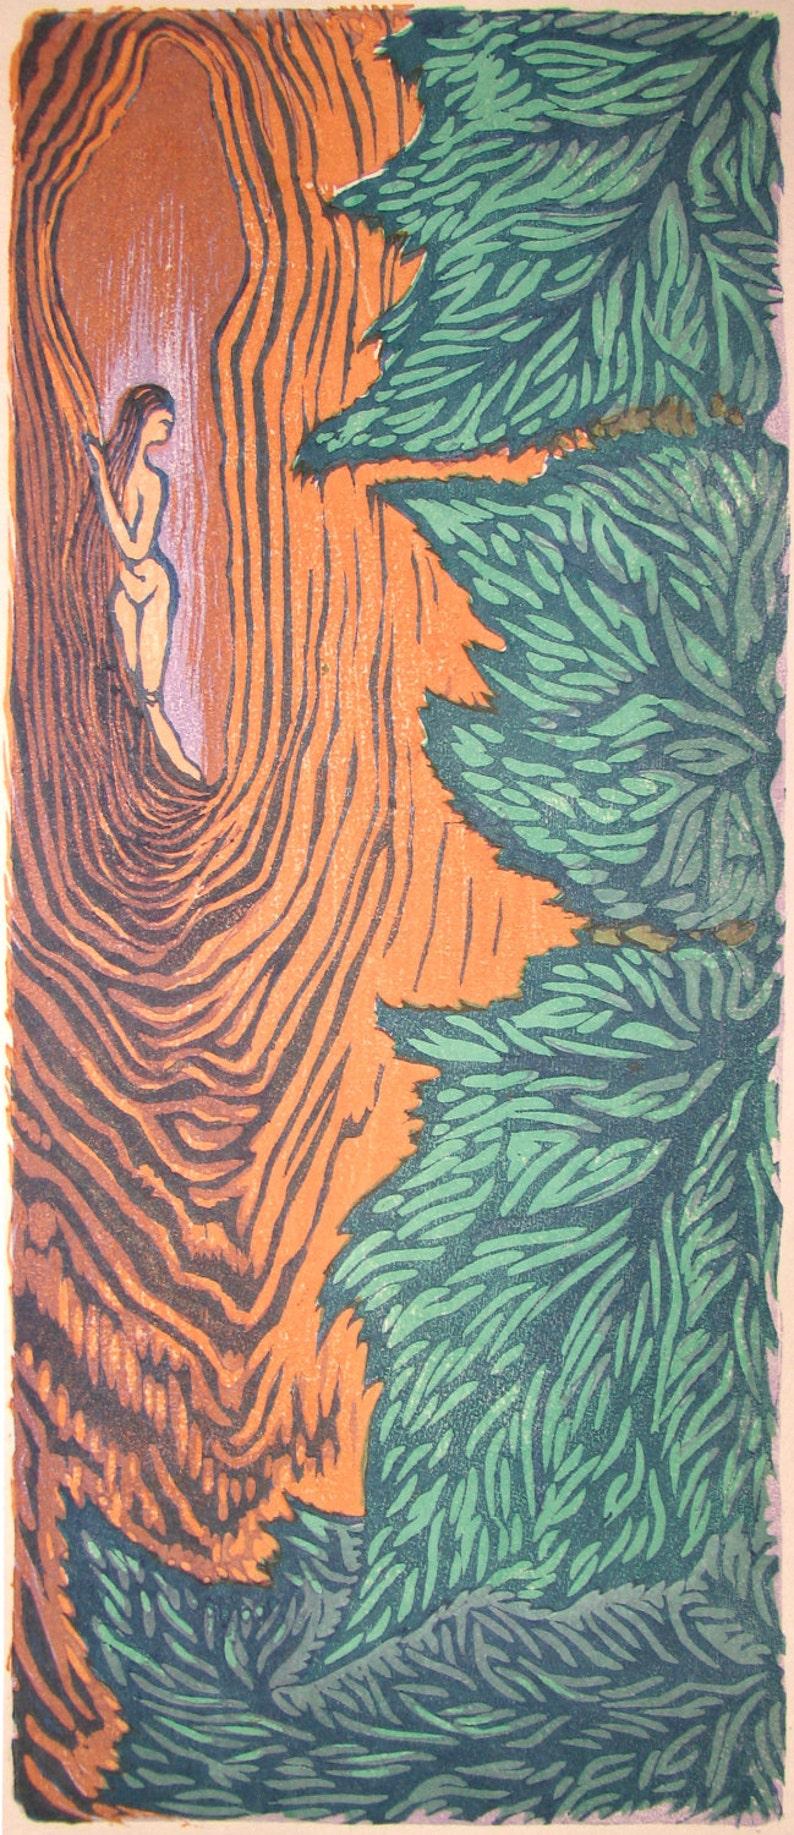 MATTED float 16x20 Original Japanese Woodblock Print Woman image 0